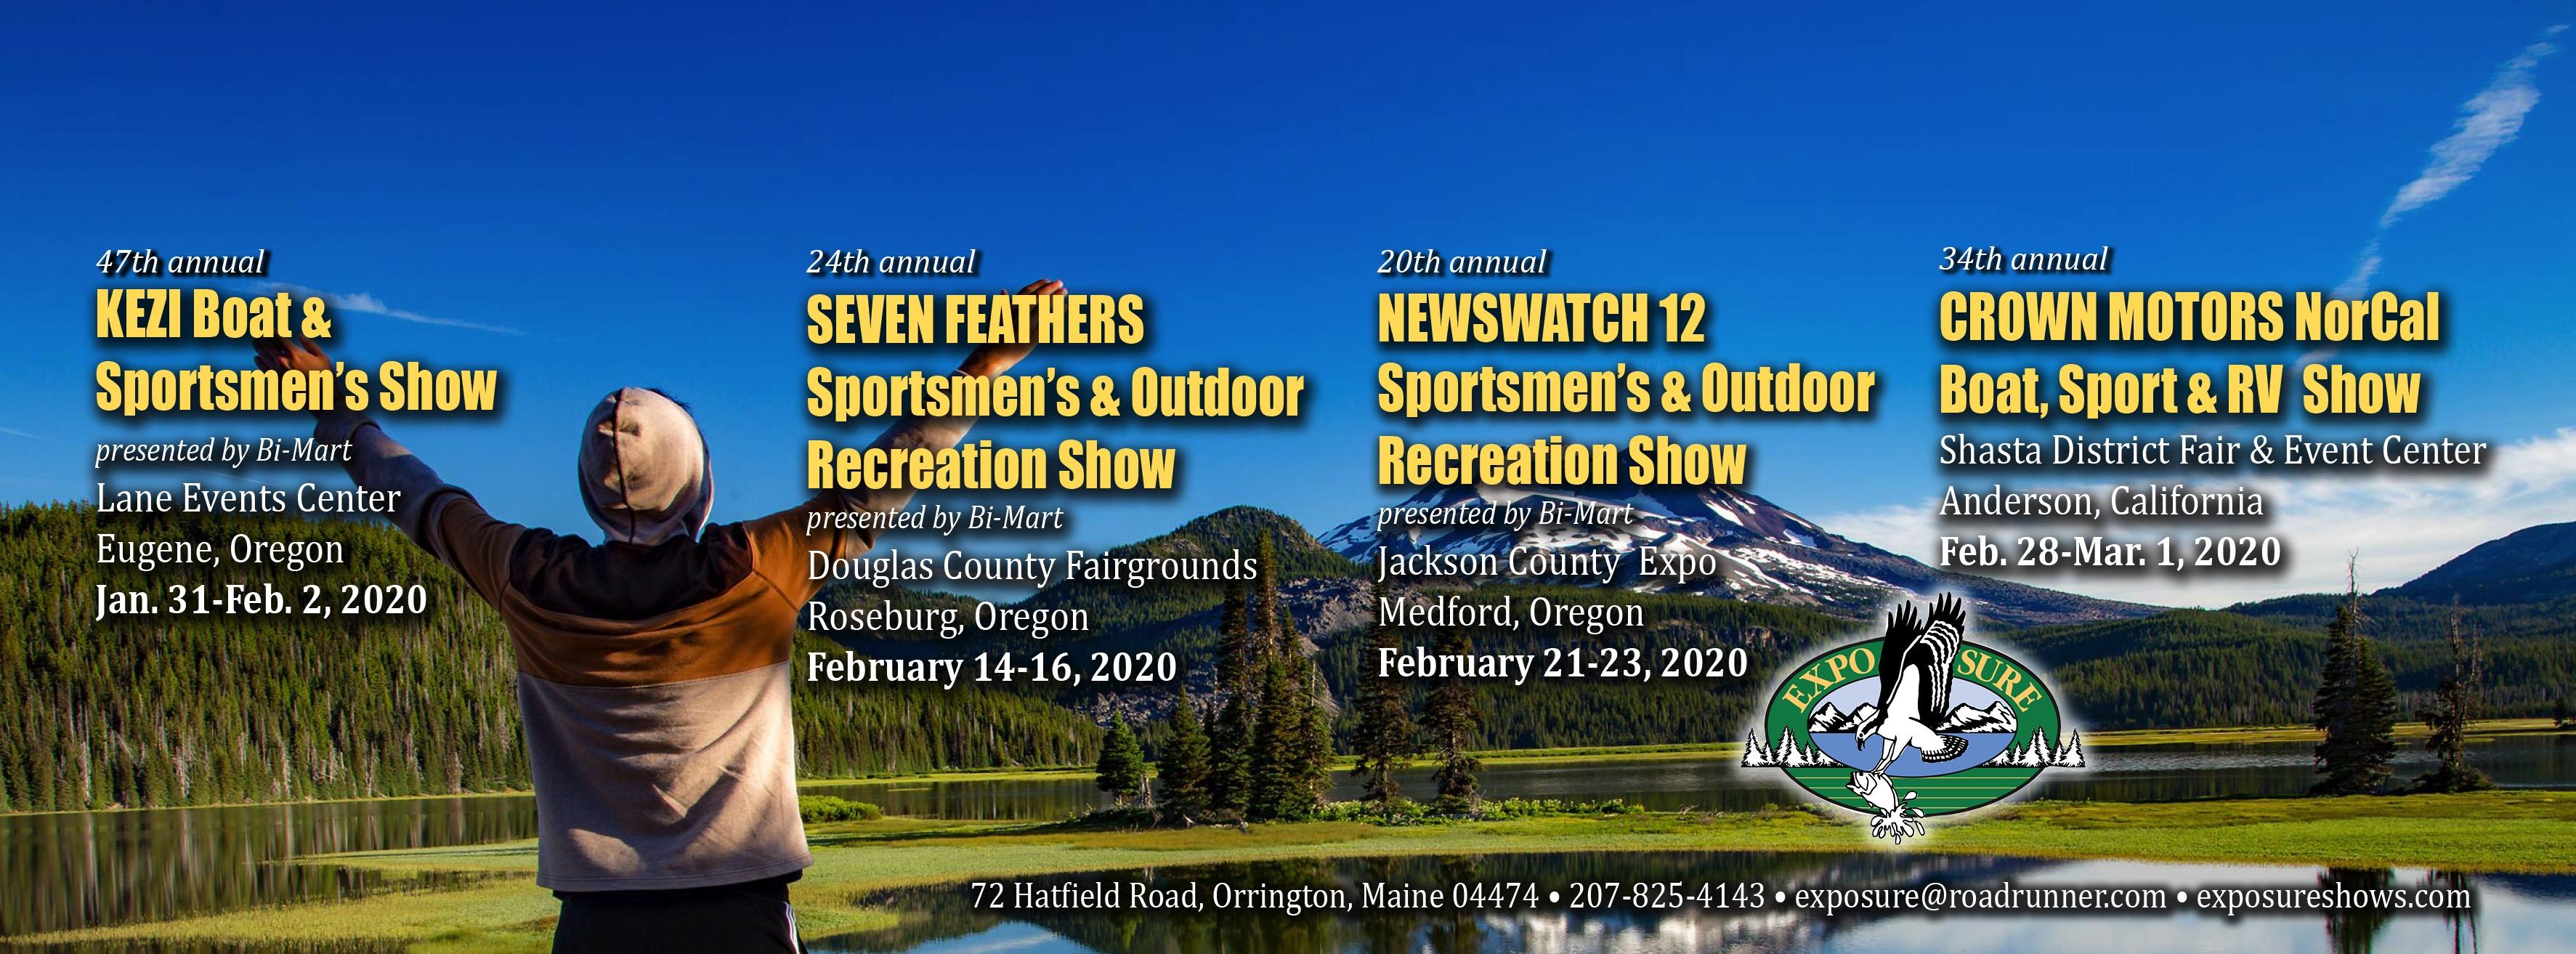 Rv Show California 2020.Sportsmen S Outdoor Recreation Show Norcal Boat Sport Rv